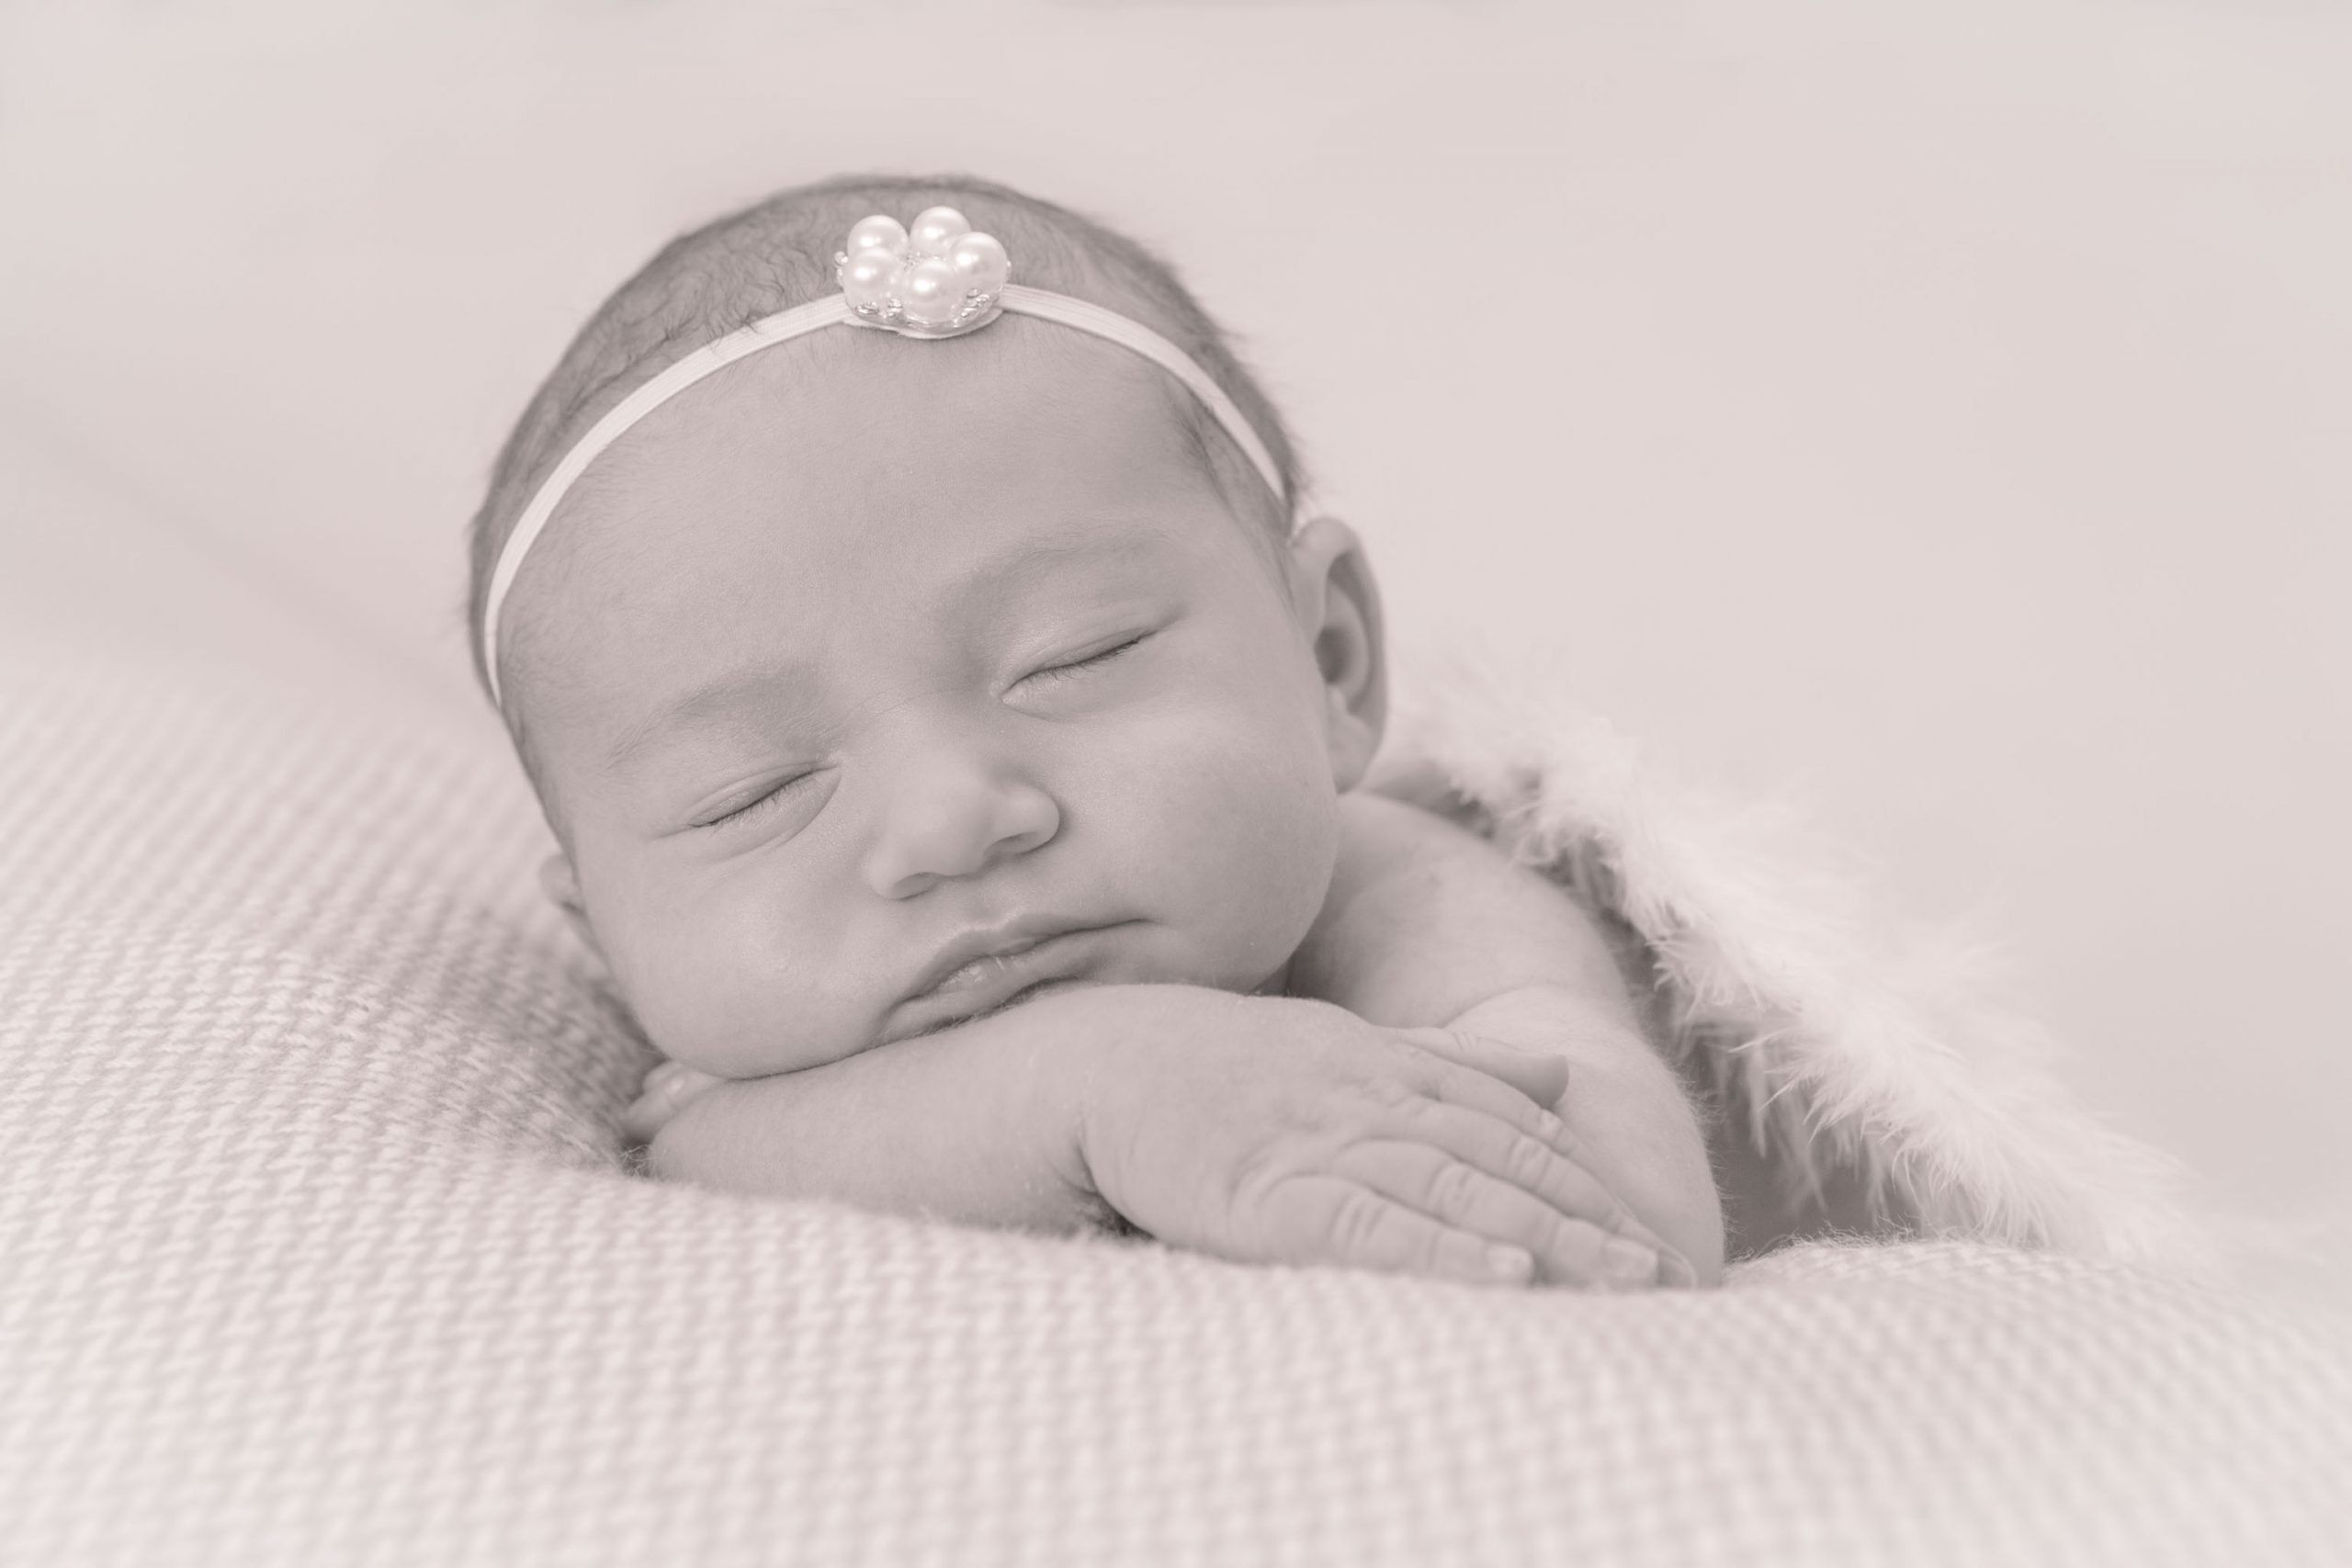 Newborn Session with Baby Lyra, Tania Miller Photography, Pontypool Newborn Photographer